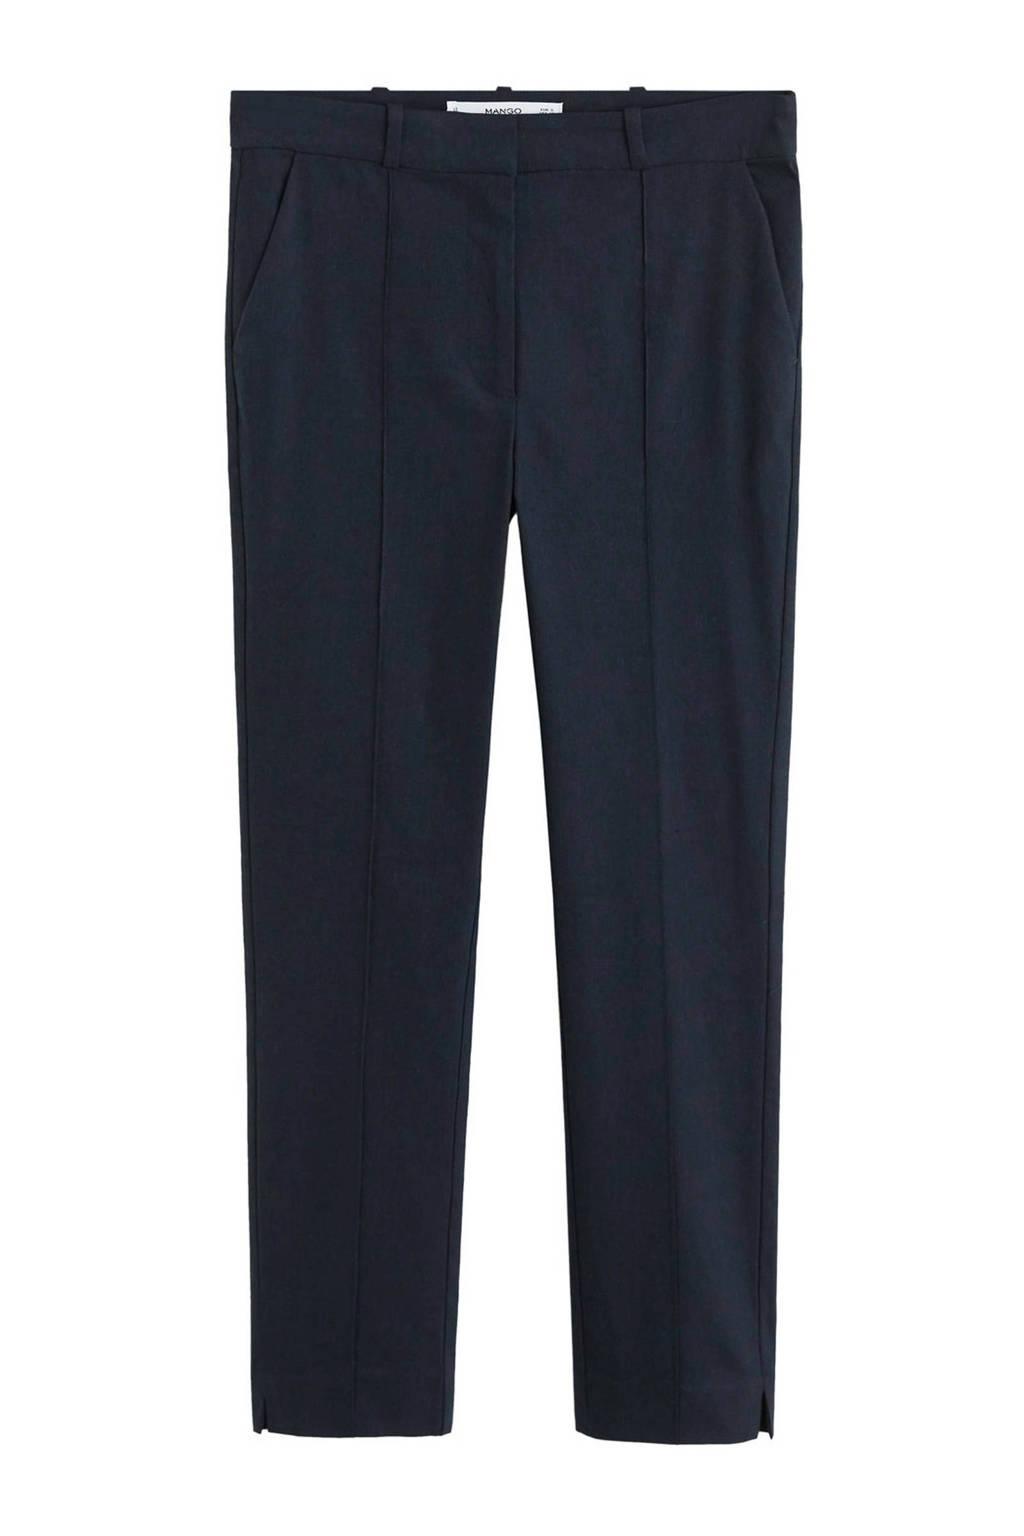 Mango skinny fit pantalon donkerblauw, Donkerblauw